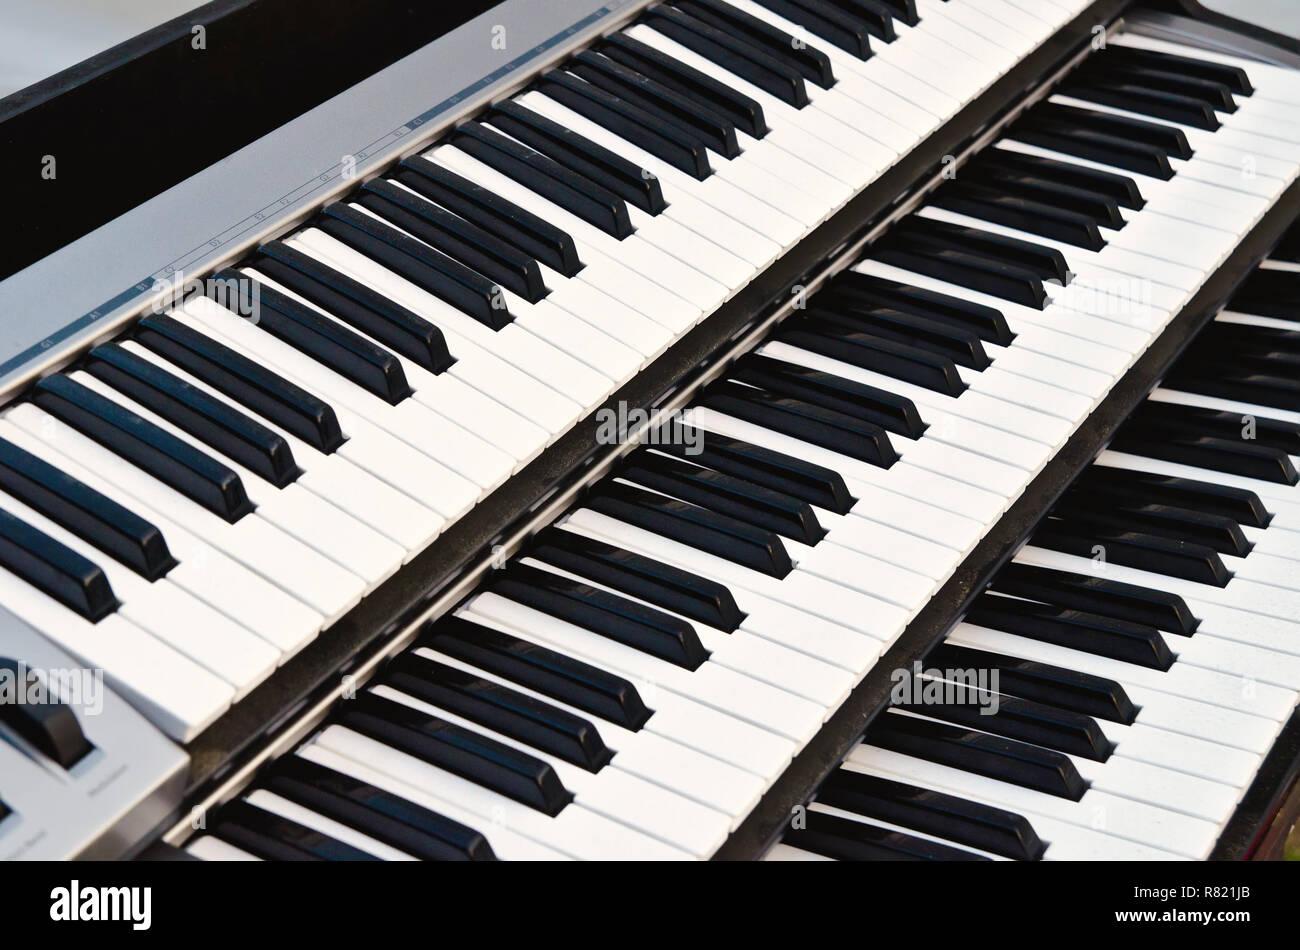 part of synthesizer keyboard closeup - Stock Image